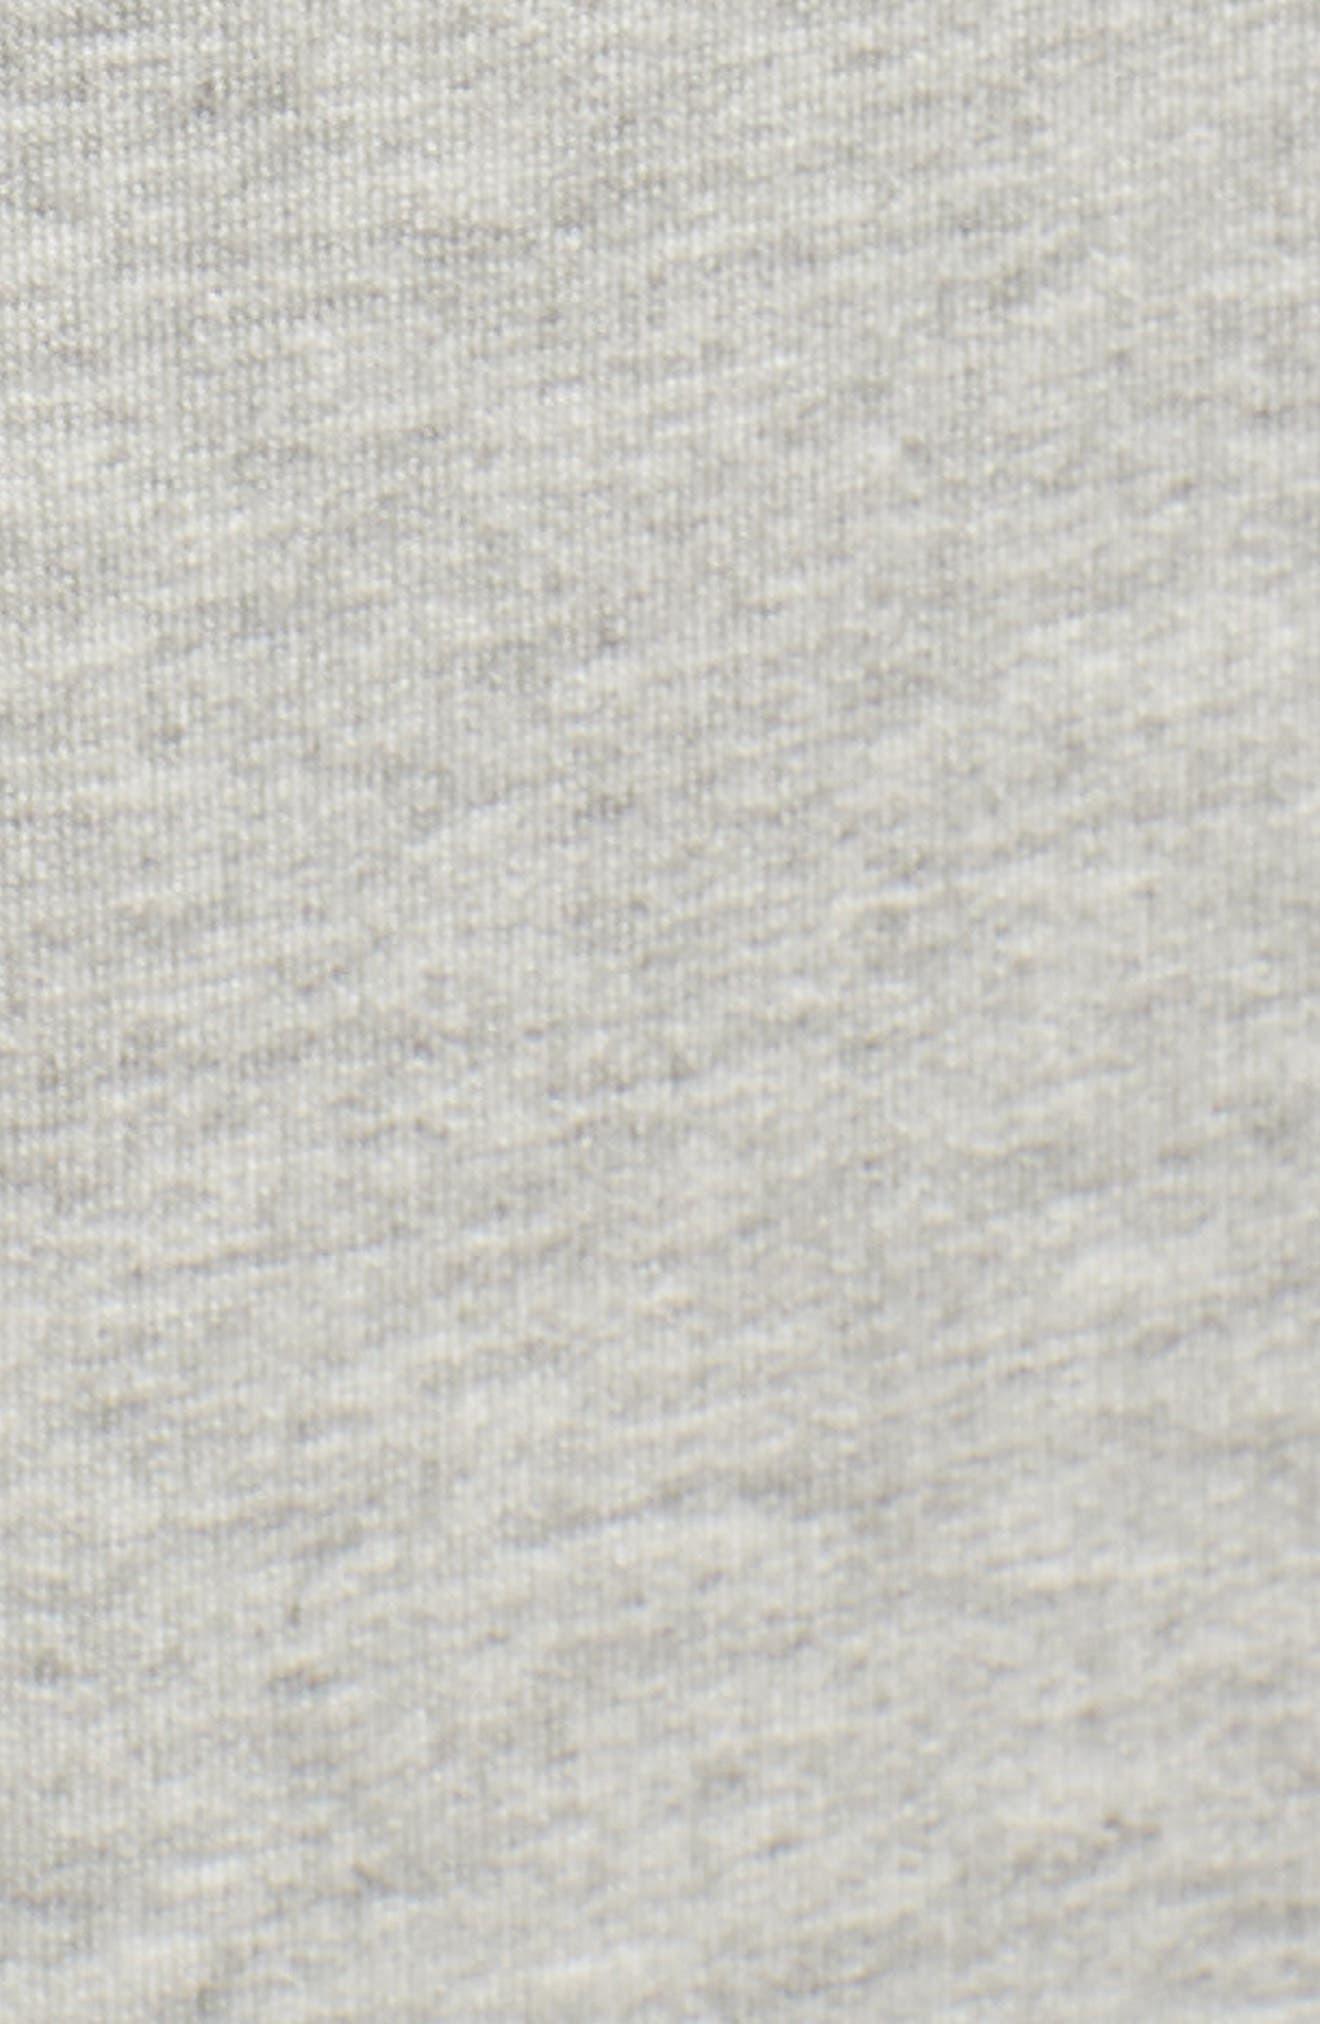 Marina Sweat Pants,                             Alternate thumbnail 6, color,                             LIGHT HEATHER GREY